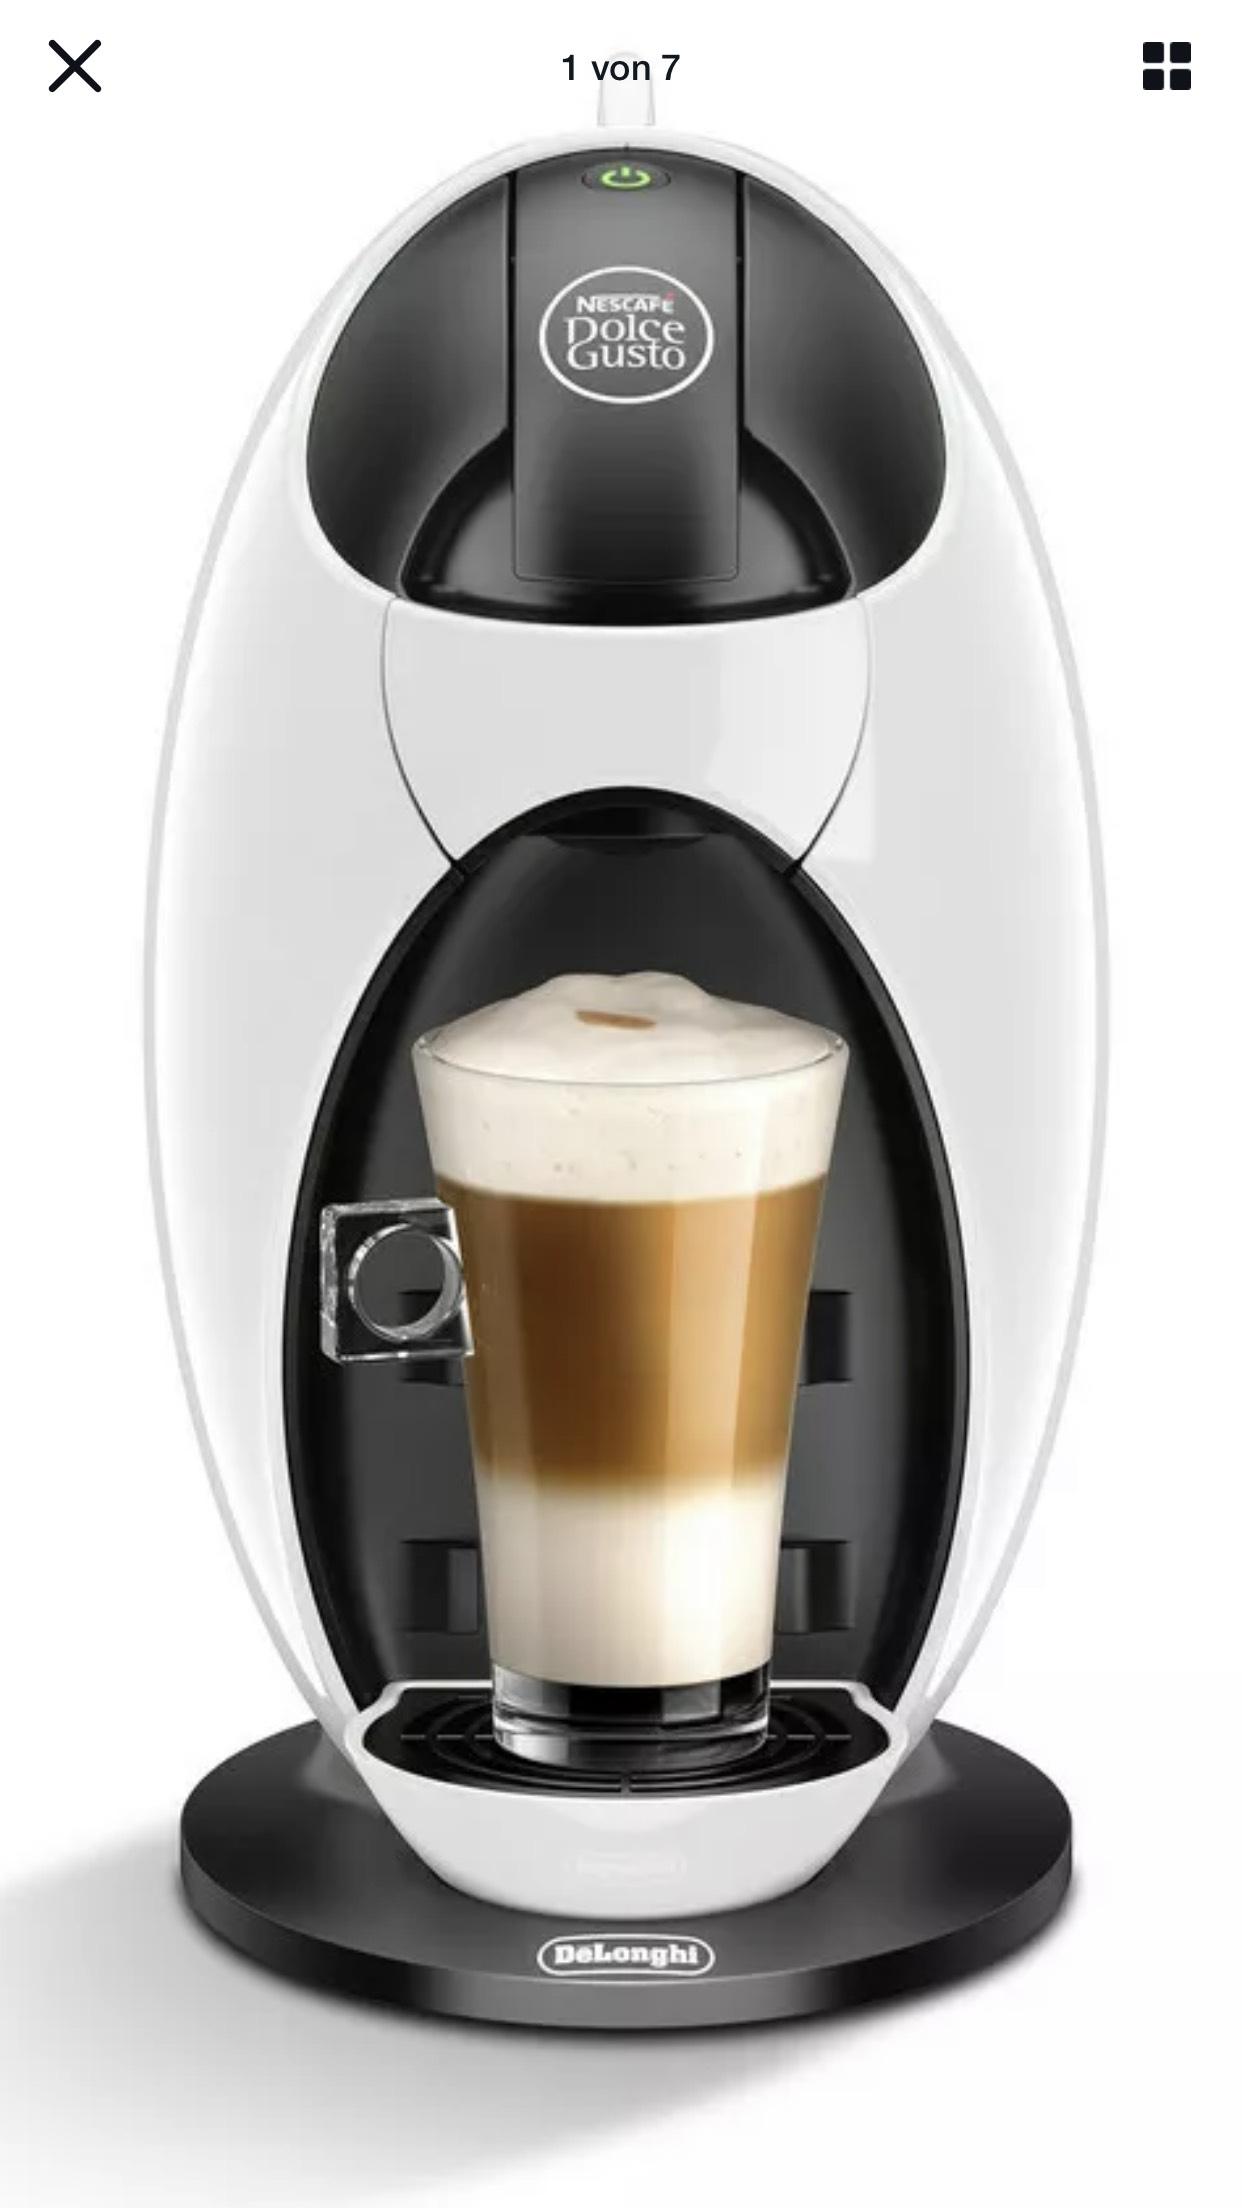 DE'LONGHI Nescafé Dolce Gusto Jovia EDG 250.W Kapselmaschine weiß 1500W (evtl mit Verpackungsmängeln)